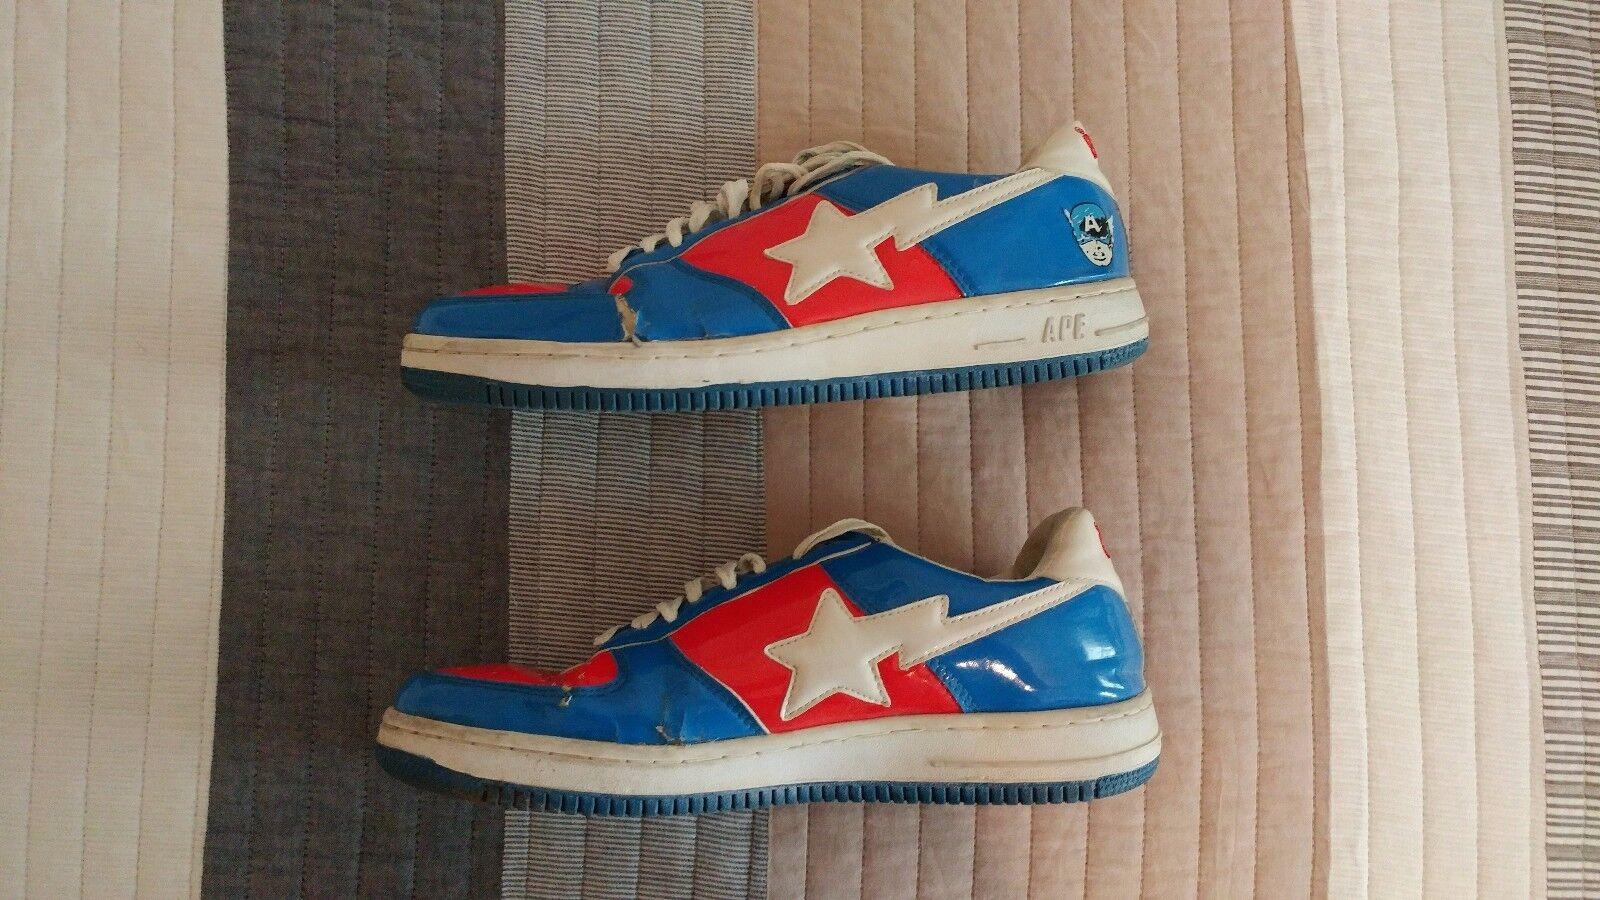 Bape Captain America Sneakers 2018 Size 12